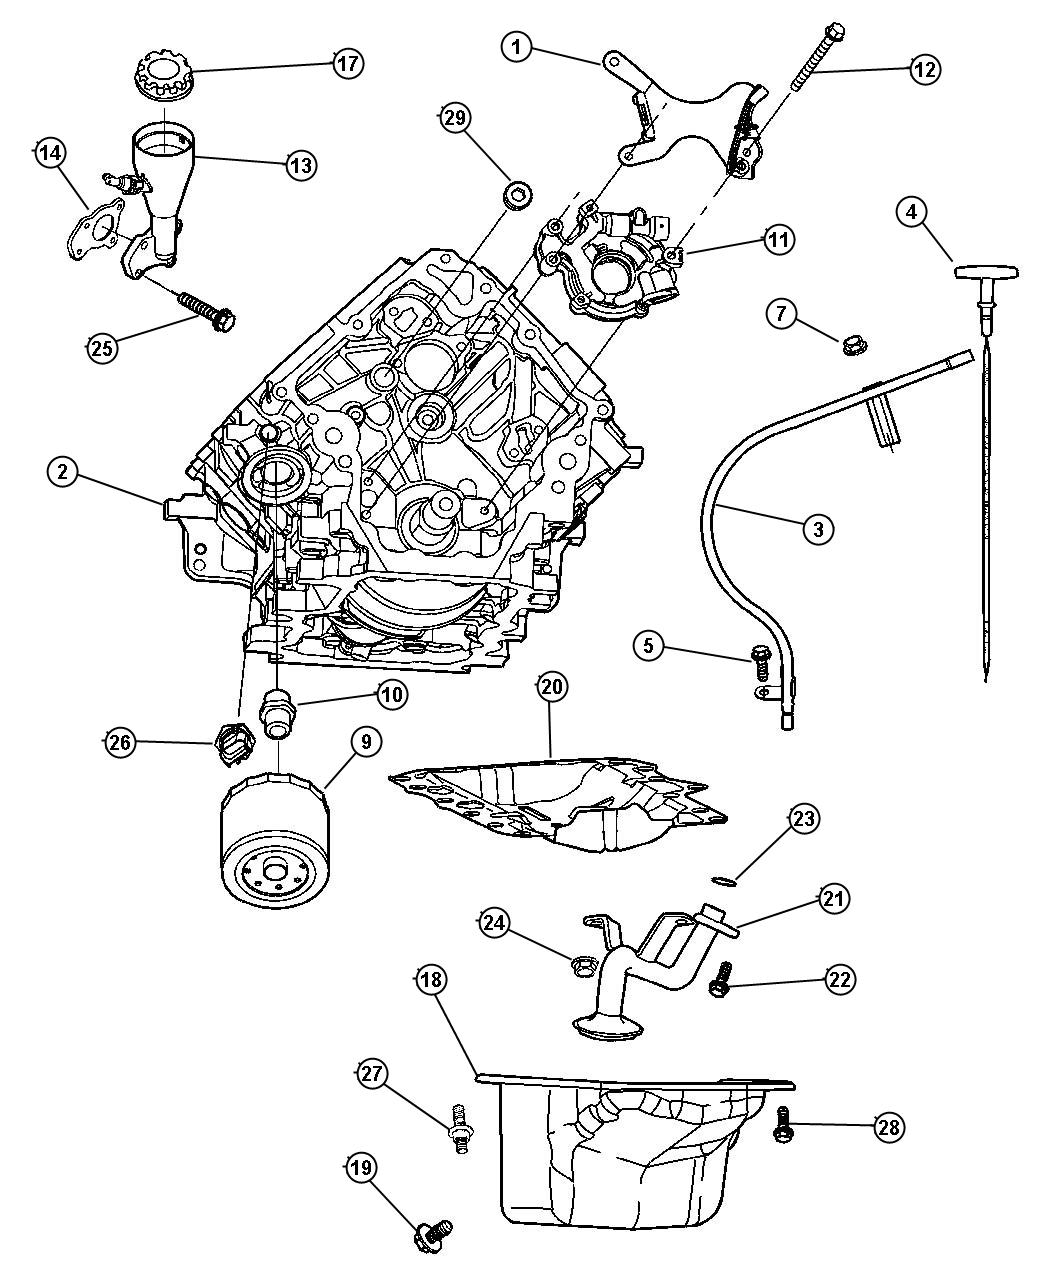 Diagram 2012 Dodge Avenger Engine Diagram Full Version Hd Quality Engine Diagram Diagramunlikelihood Nuitdeboutaix Fr